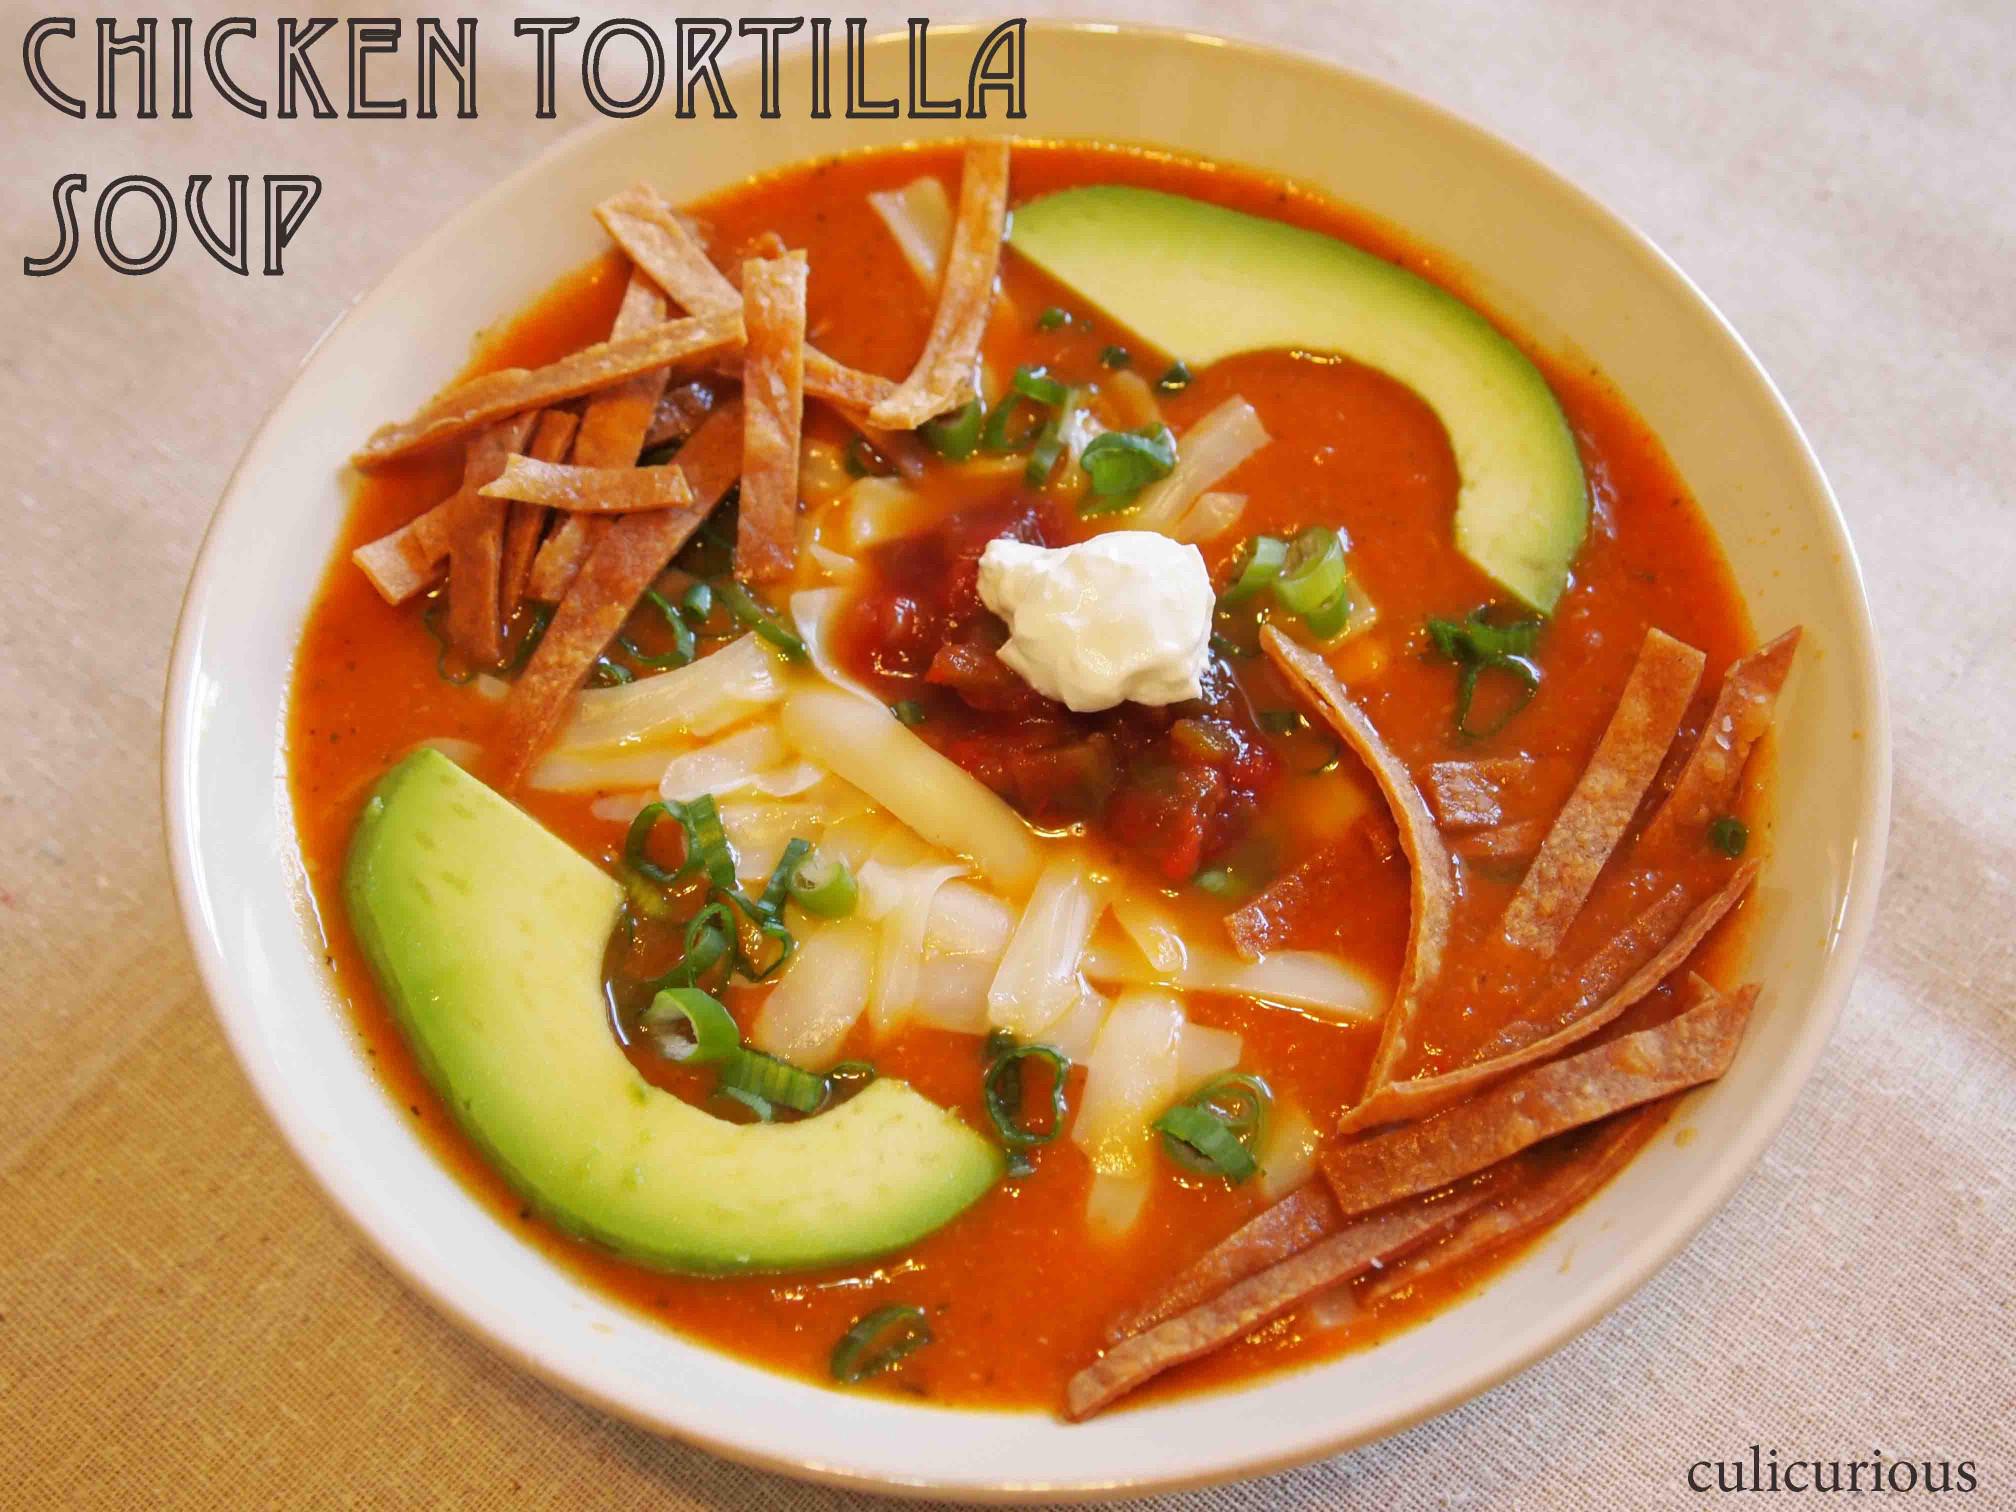 Chicken Tortilla Soup  Chicken Tortilla Soup Recipe culicurious